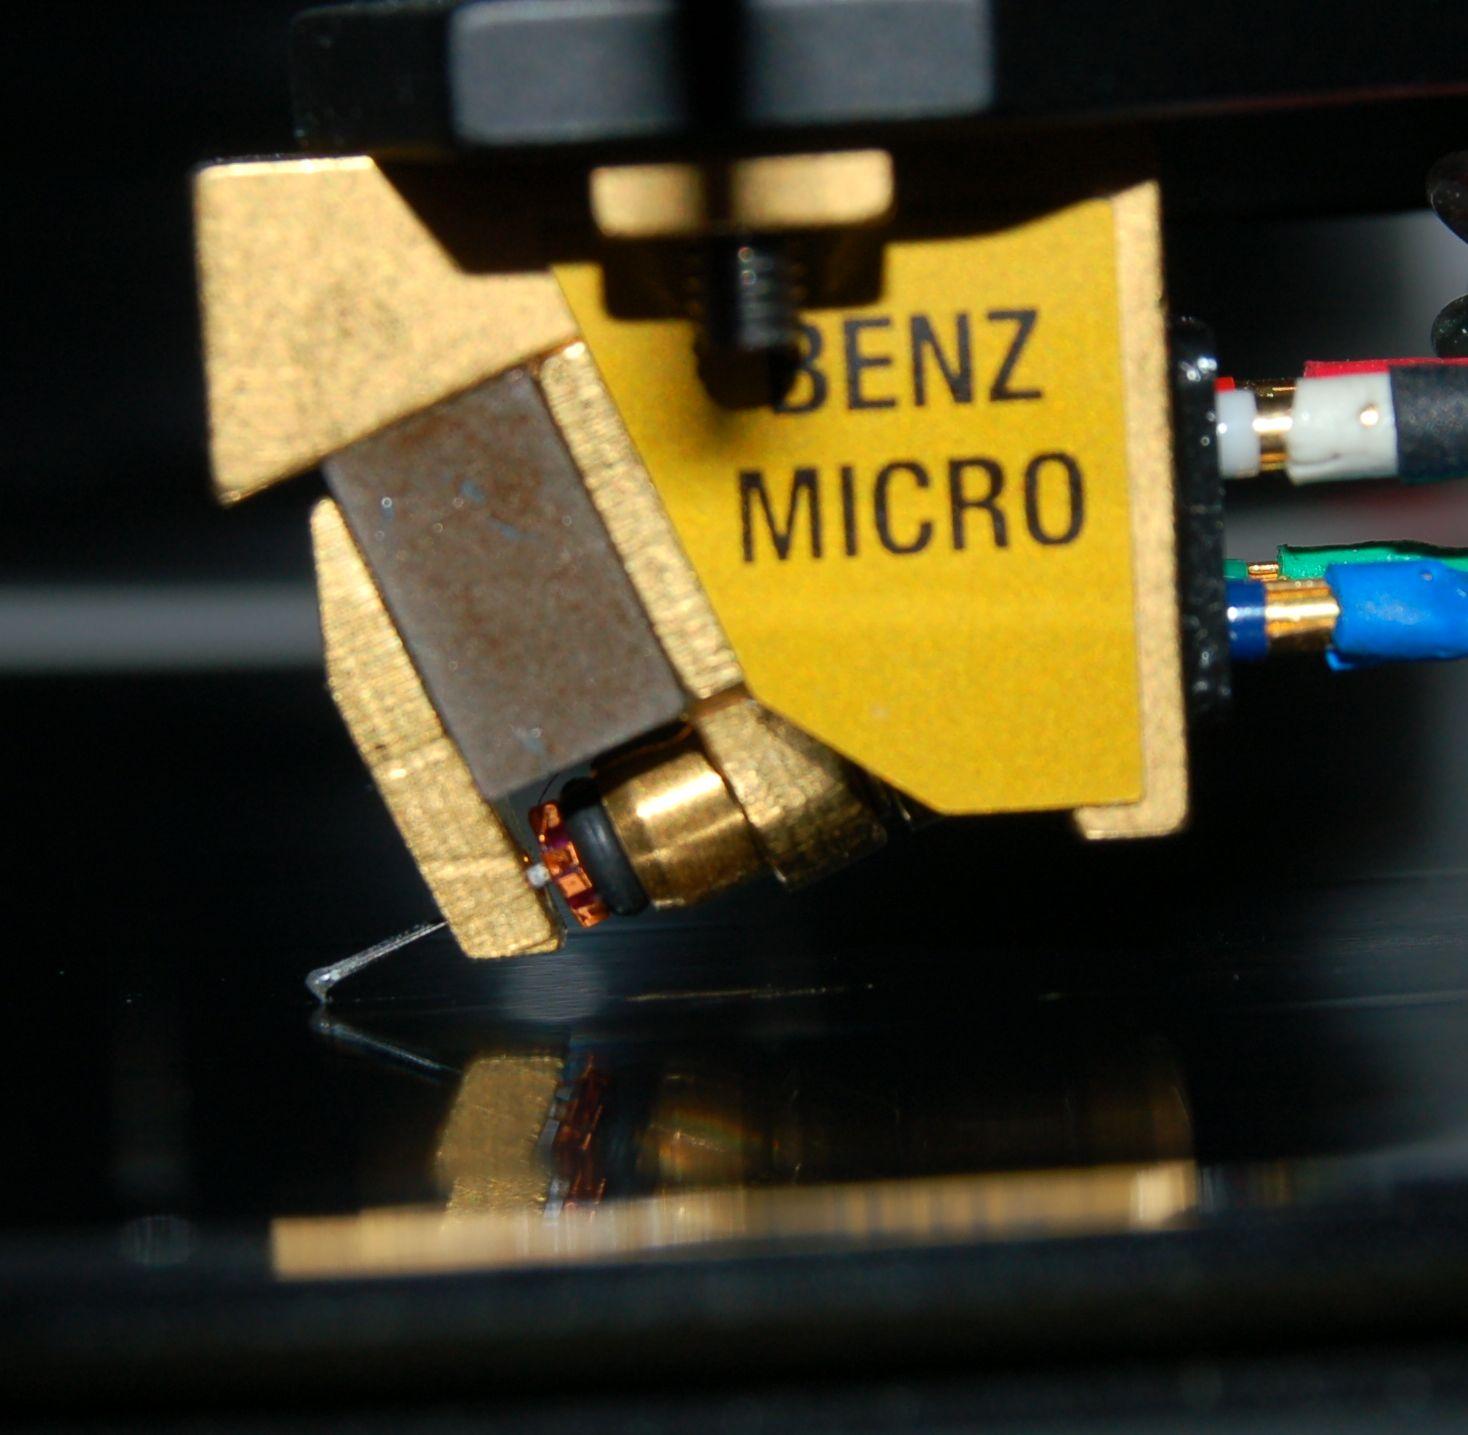 Benz_micro_t_.jpg